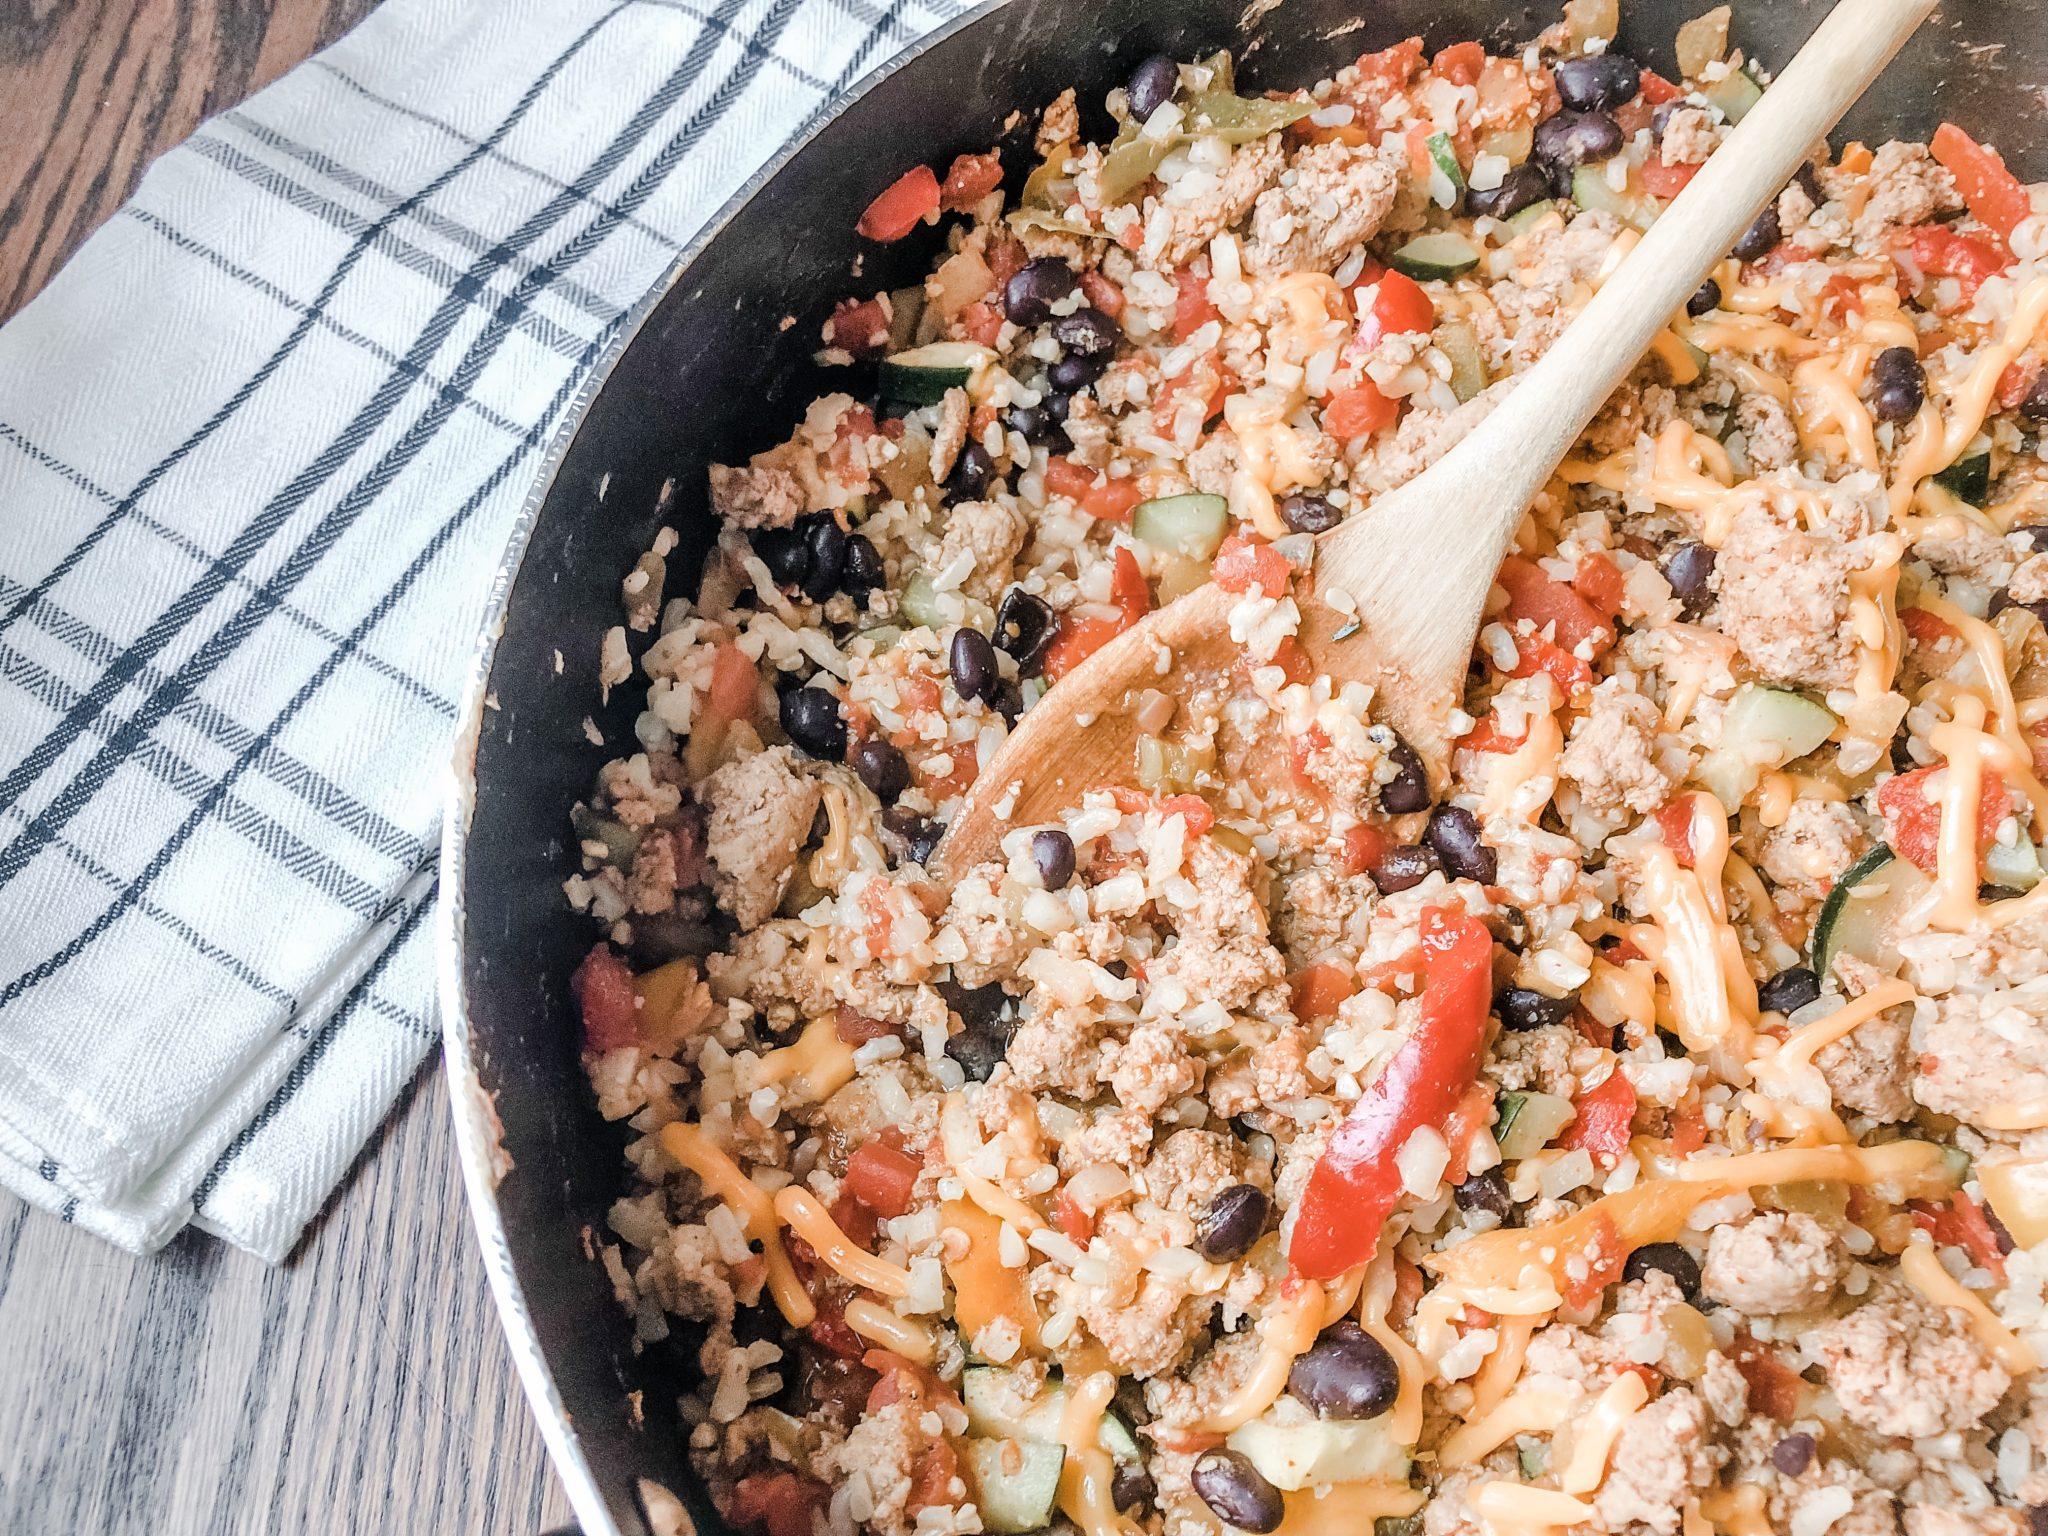 Turkey Taco Skillet: Fast, Easy & Healthy Weeknight Meal